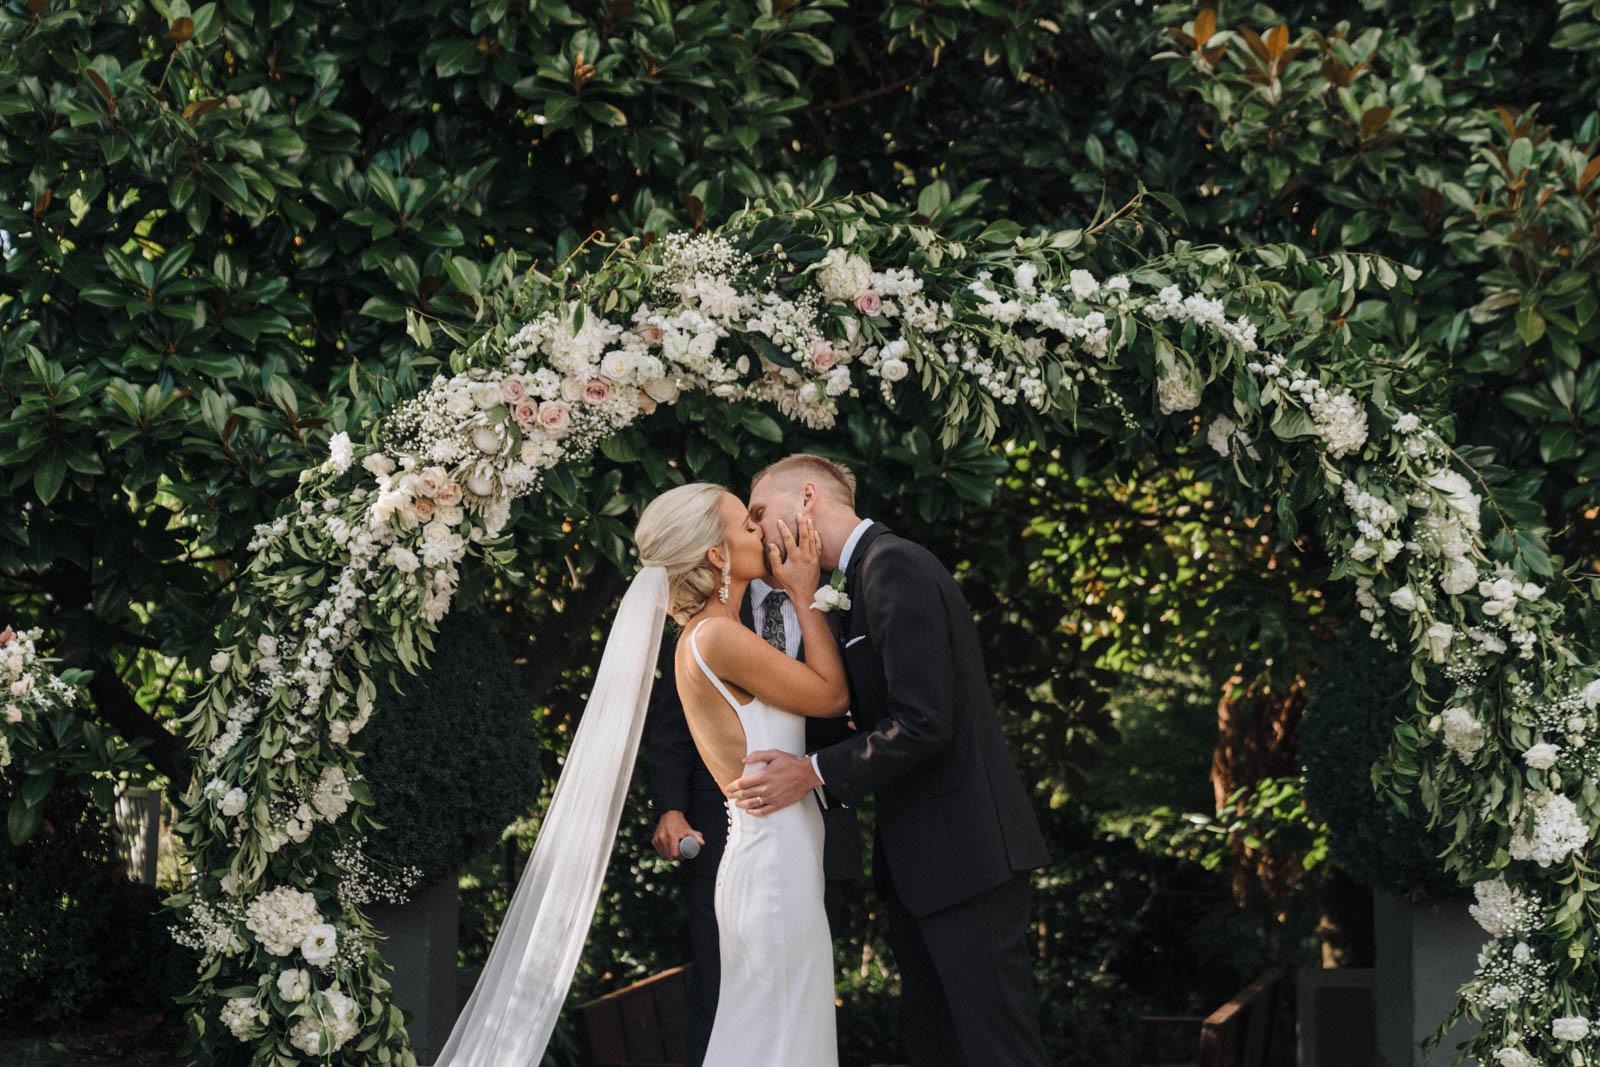 newfound-k-s-hilton-taupo-wedding-photographer-038